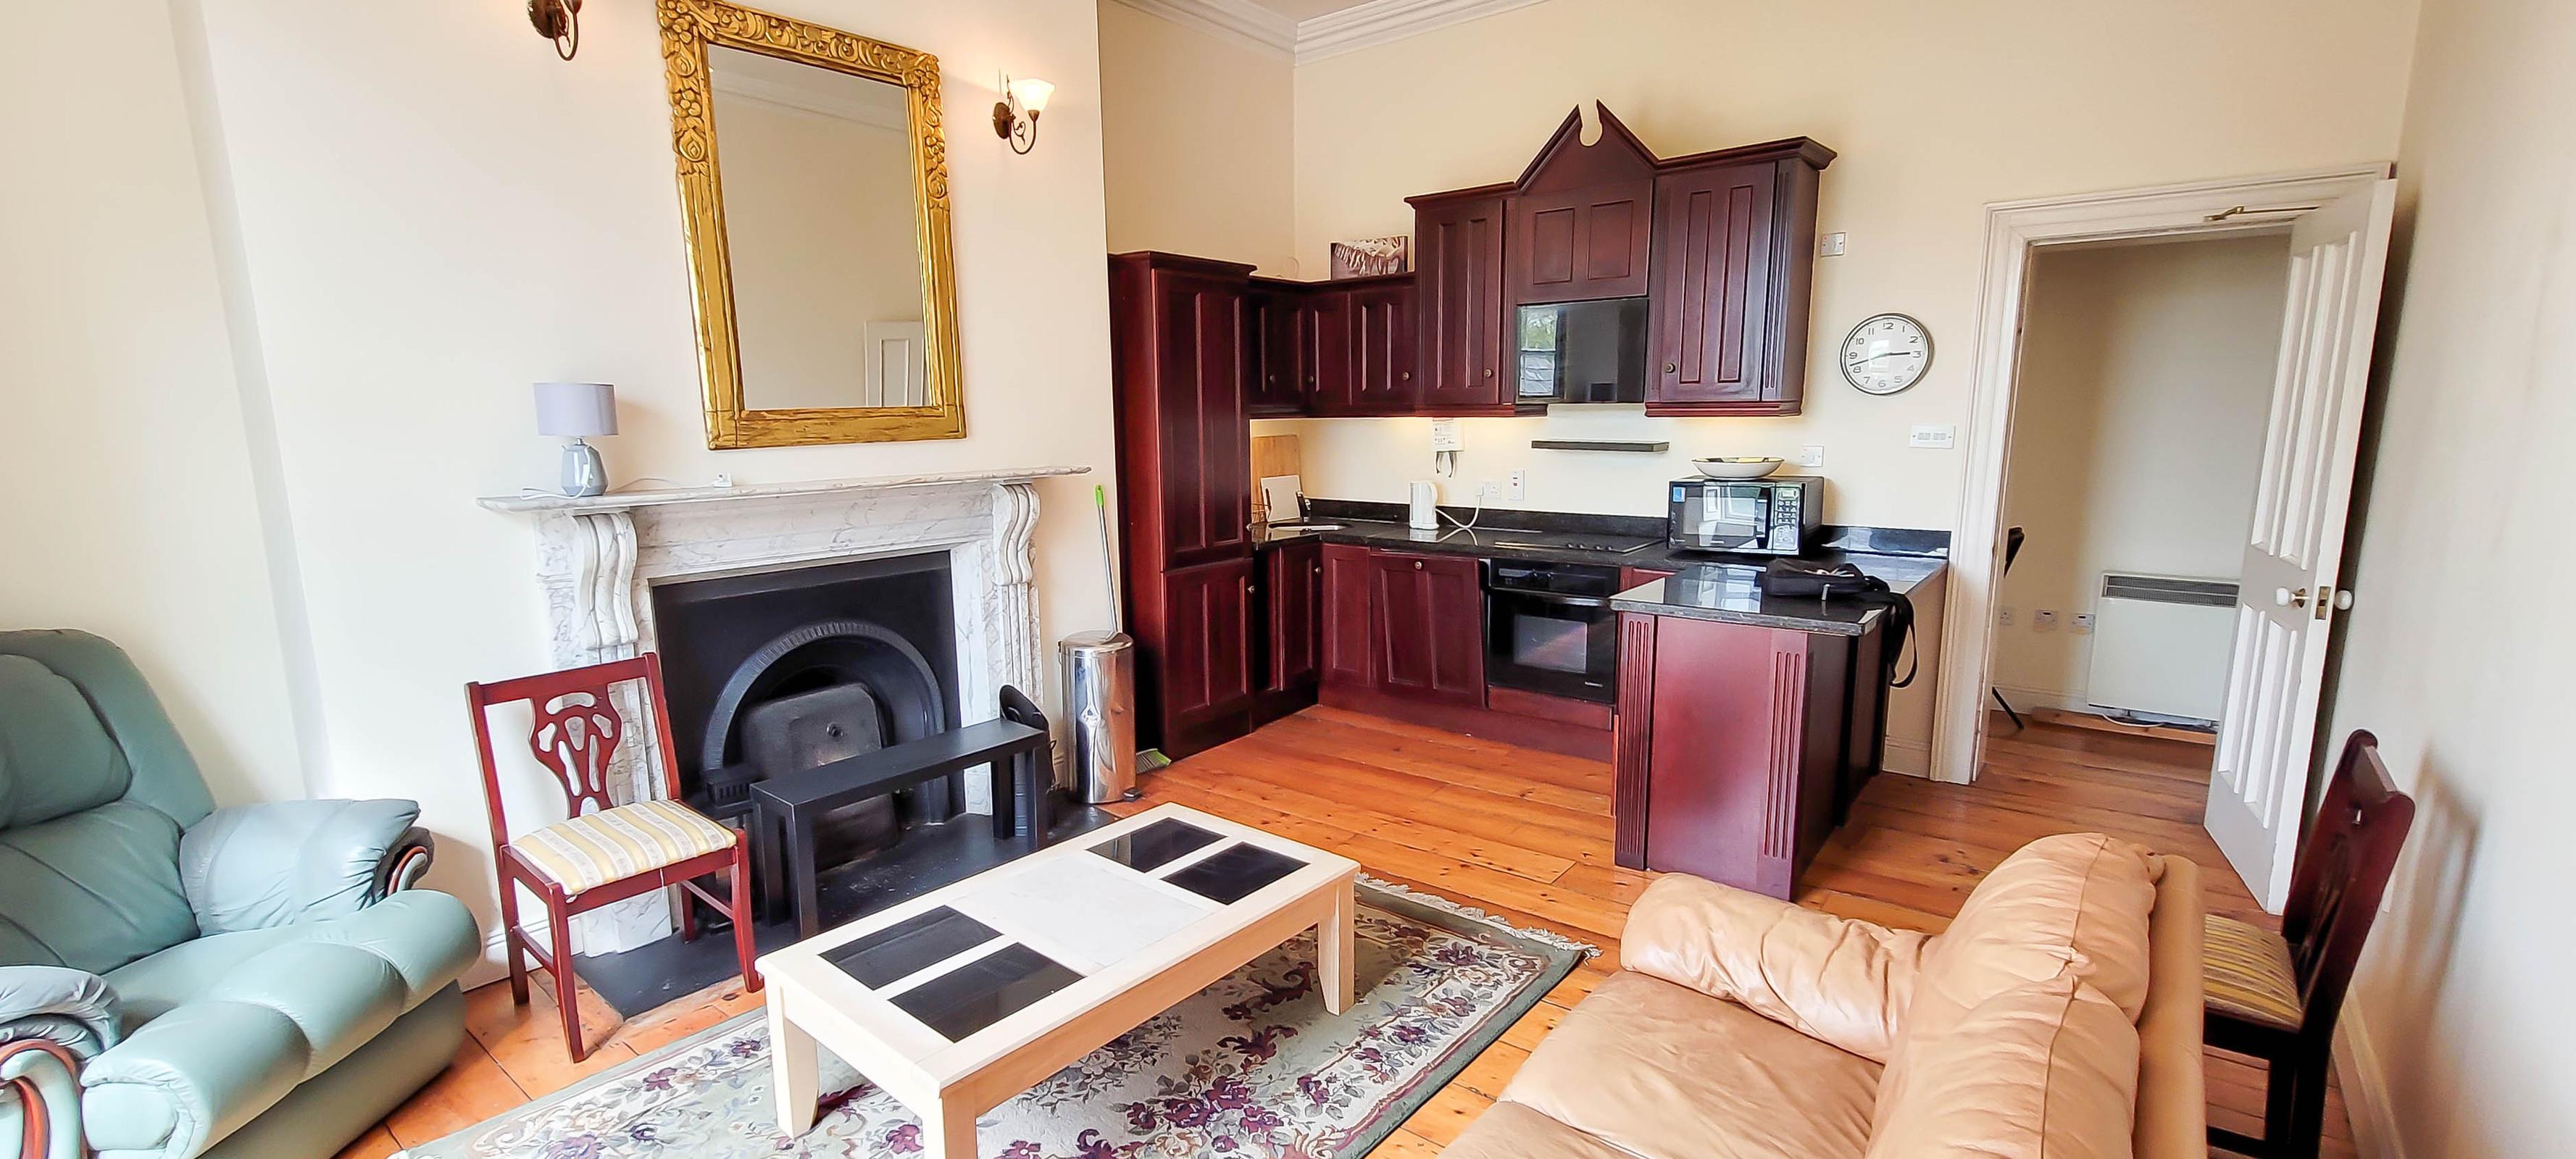 Apartment 3, 43 Pembroke Road, Ballsbridge, Dublin 4